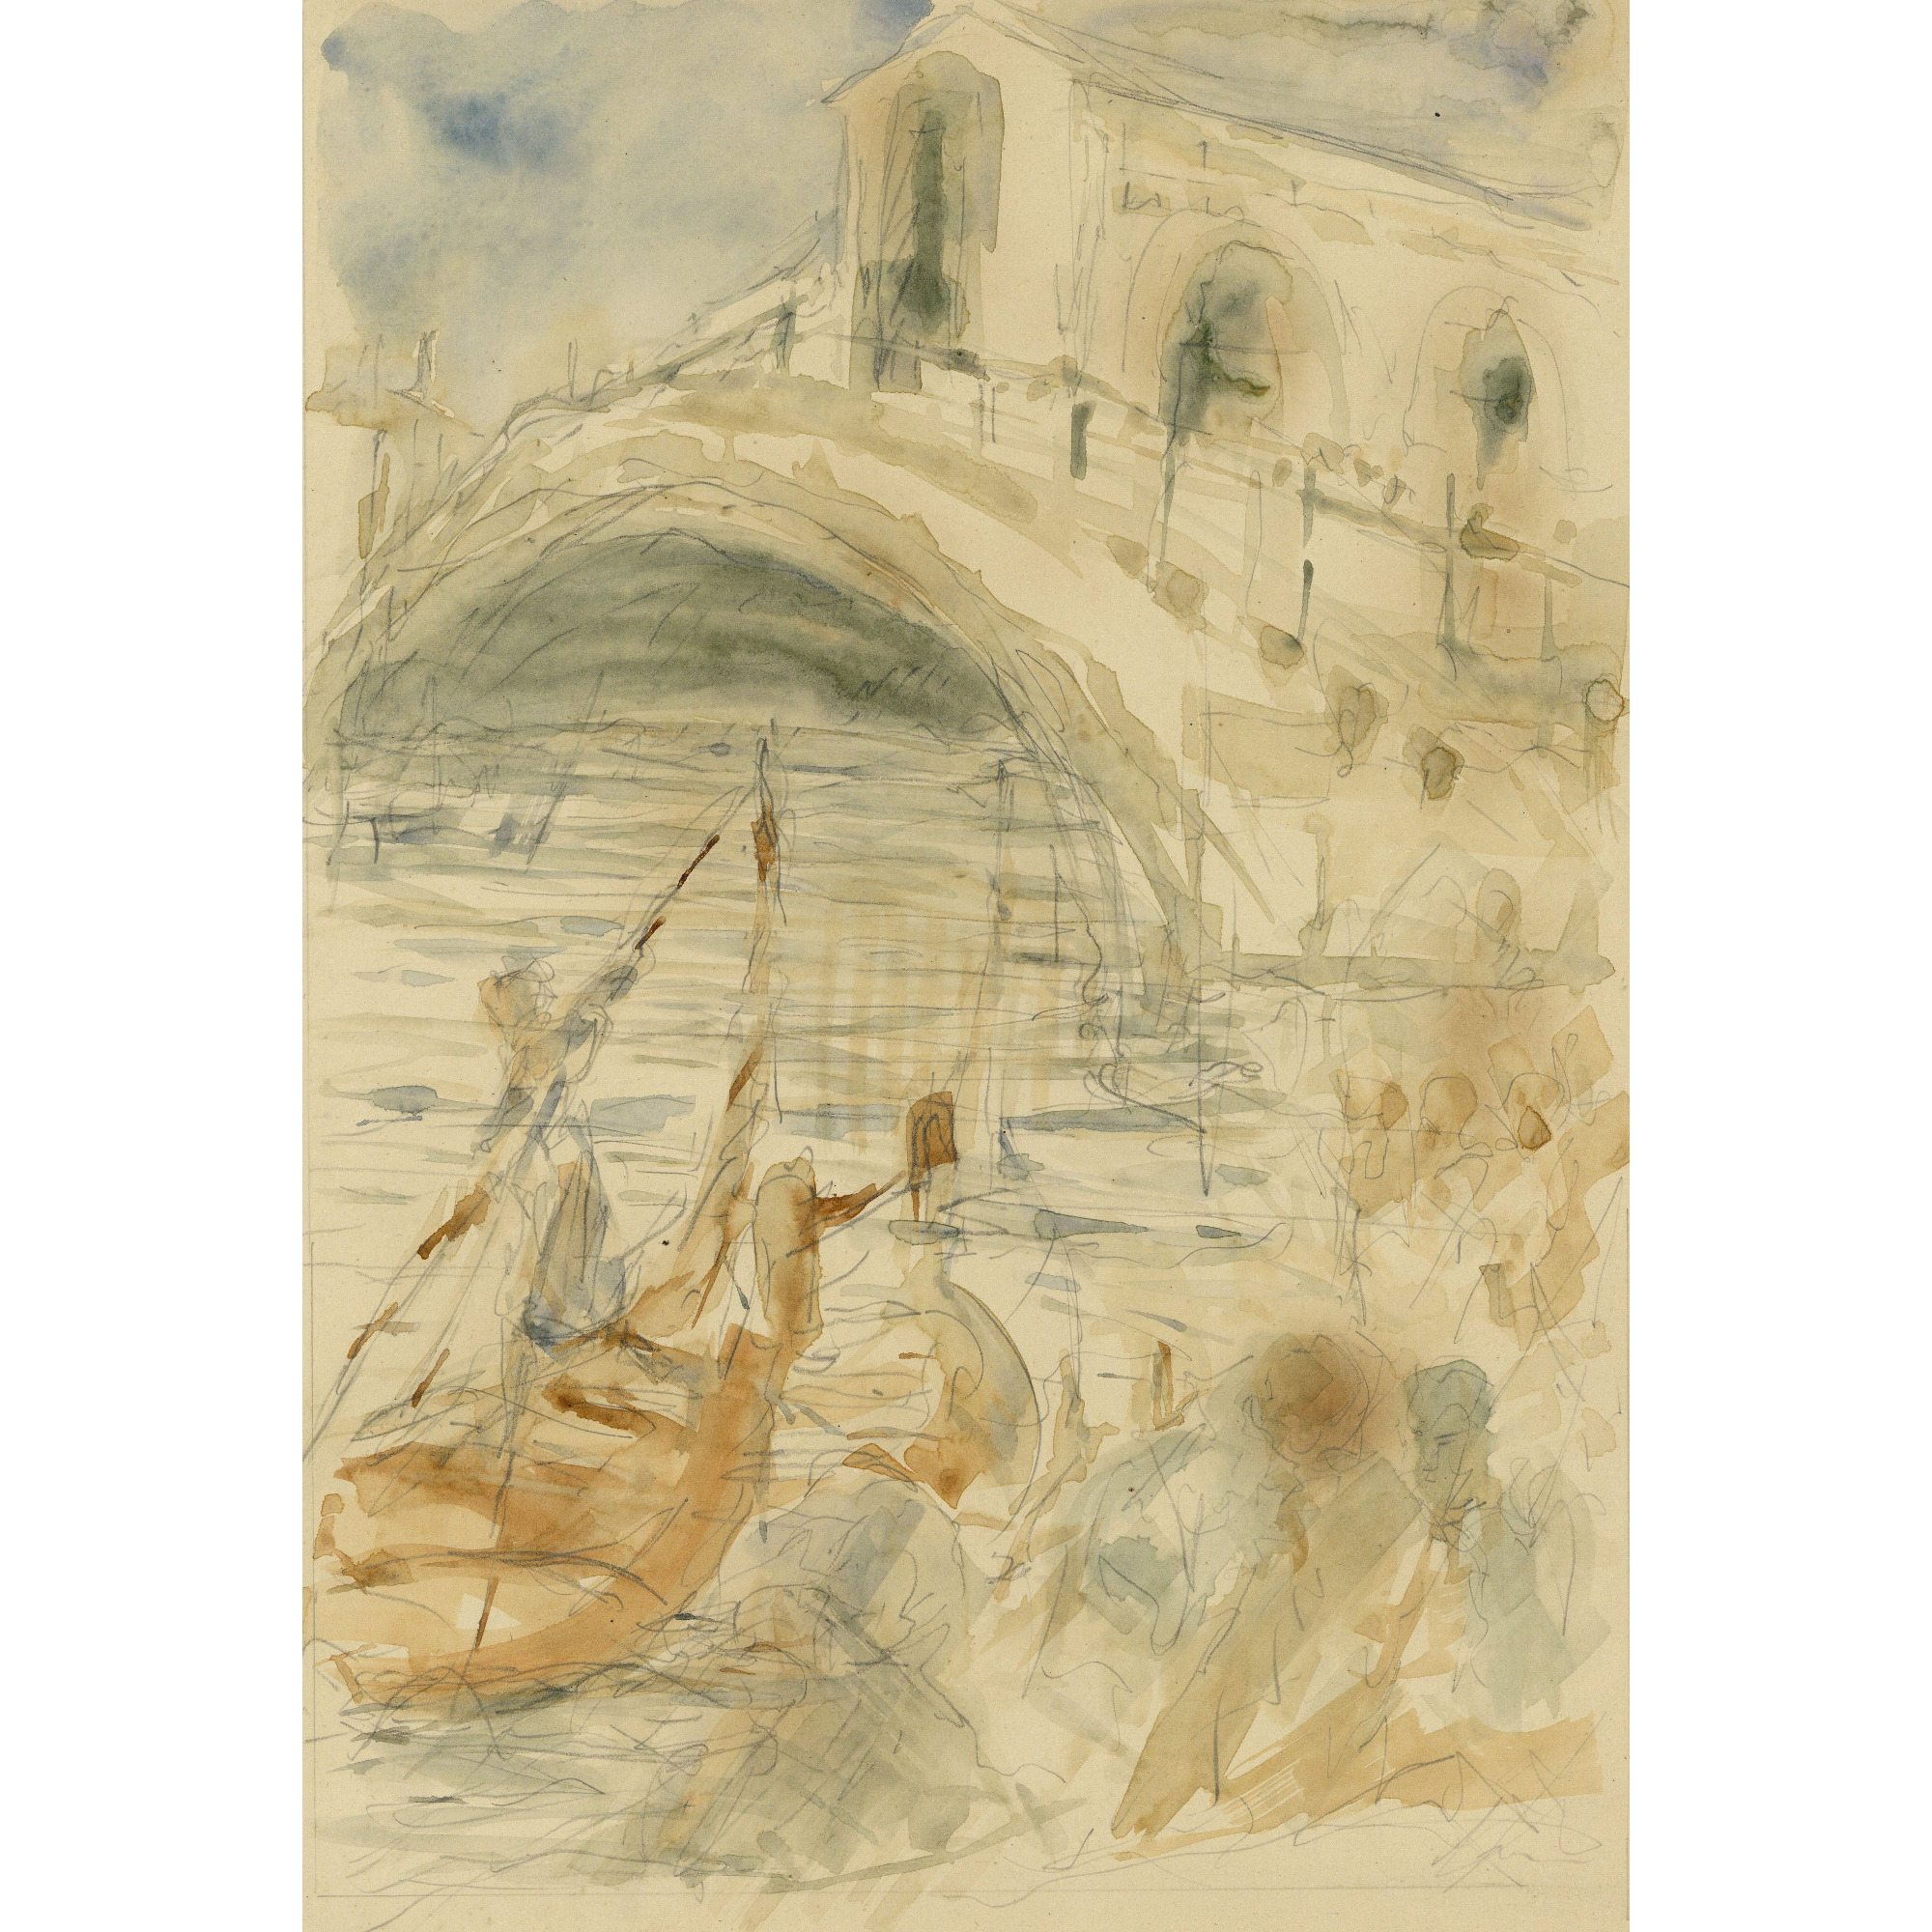 Pre-Raphaelite Drawing of a Gondola with Rialto Bridge, Venice, Italy